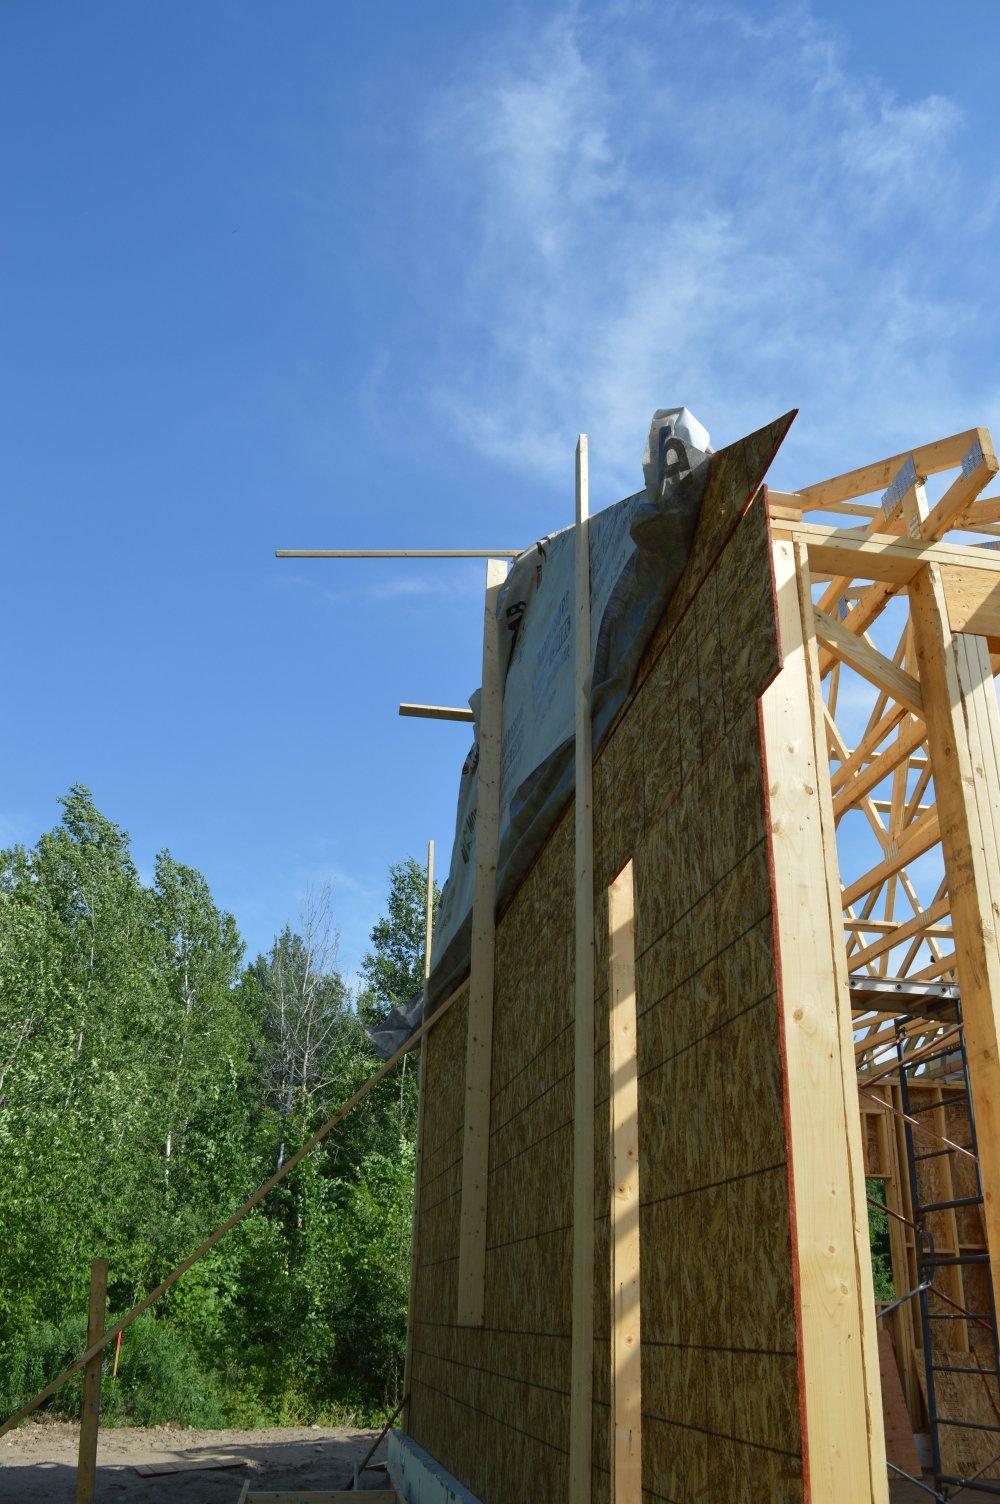 Grandor lumber roof trusses